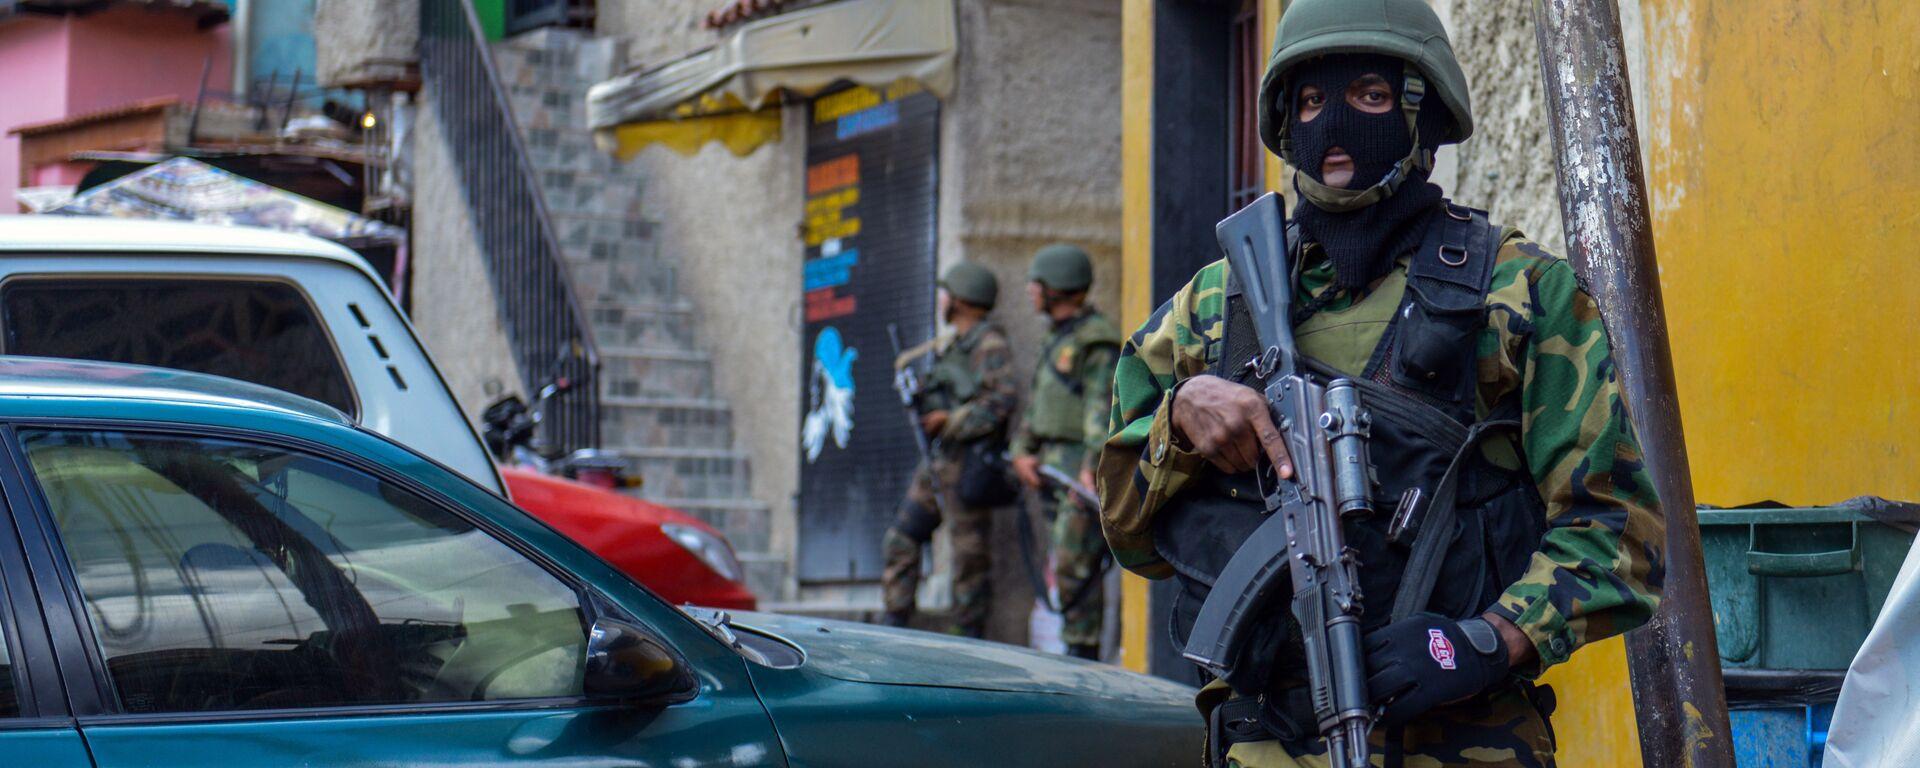 Guardia Nacional Bolivariana en en la favela Cota 905 (archivo) - Sputnik Mundo, 1920, 09.07.2021